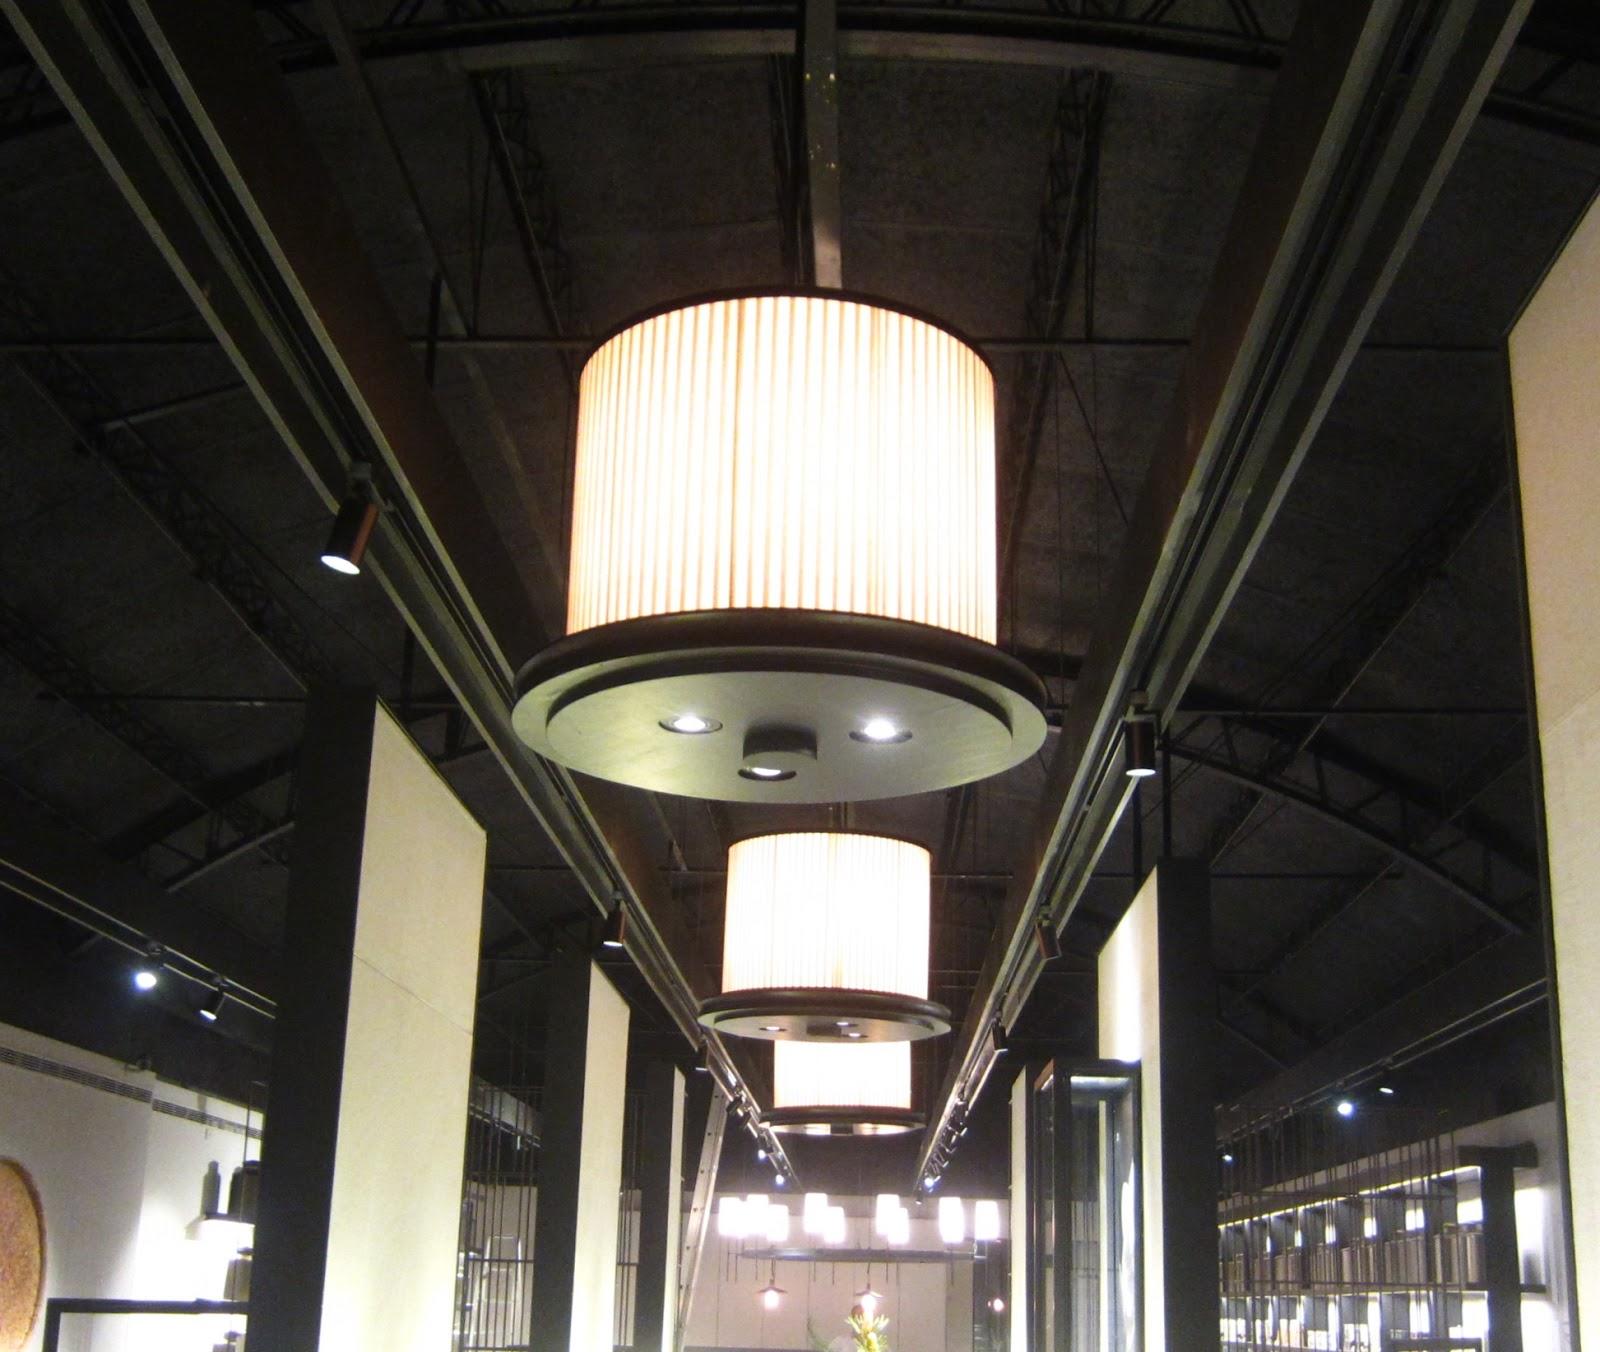 Dinli Lighting 鼎立燈飾有限公司 - 專業訂製燈具: 訂製室內吊燈